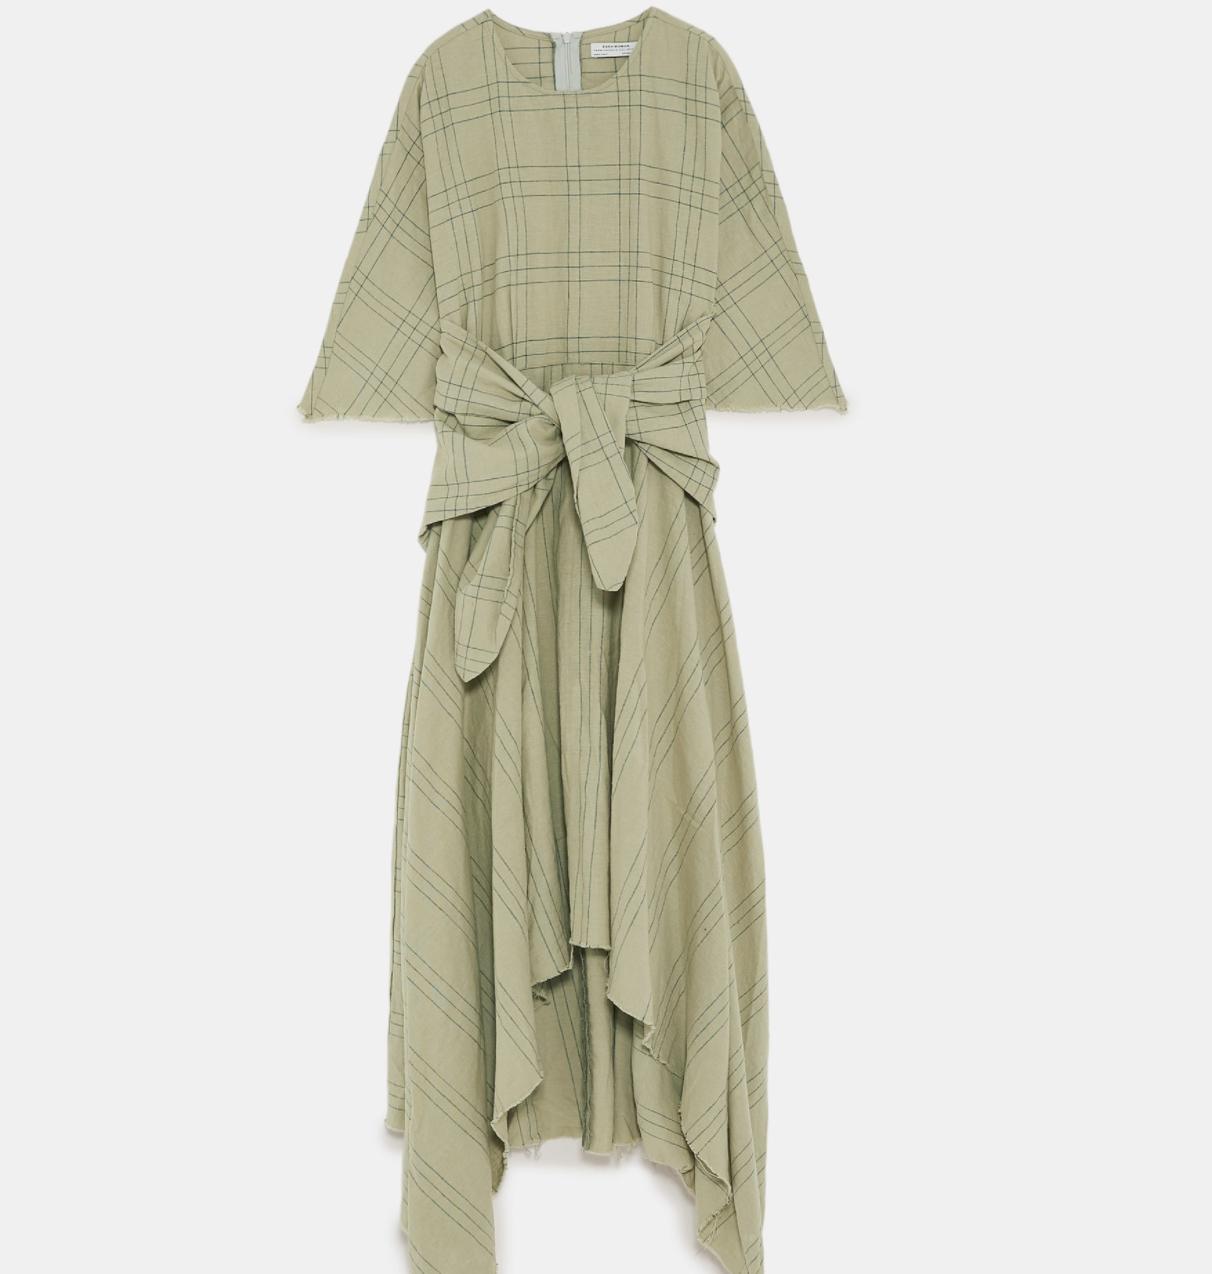 Zara Dress, $70